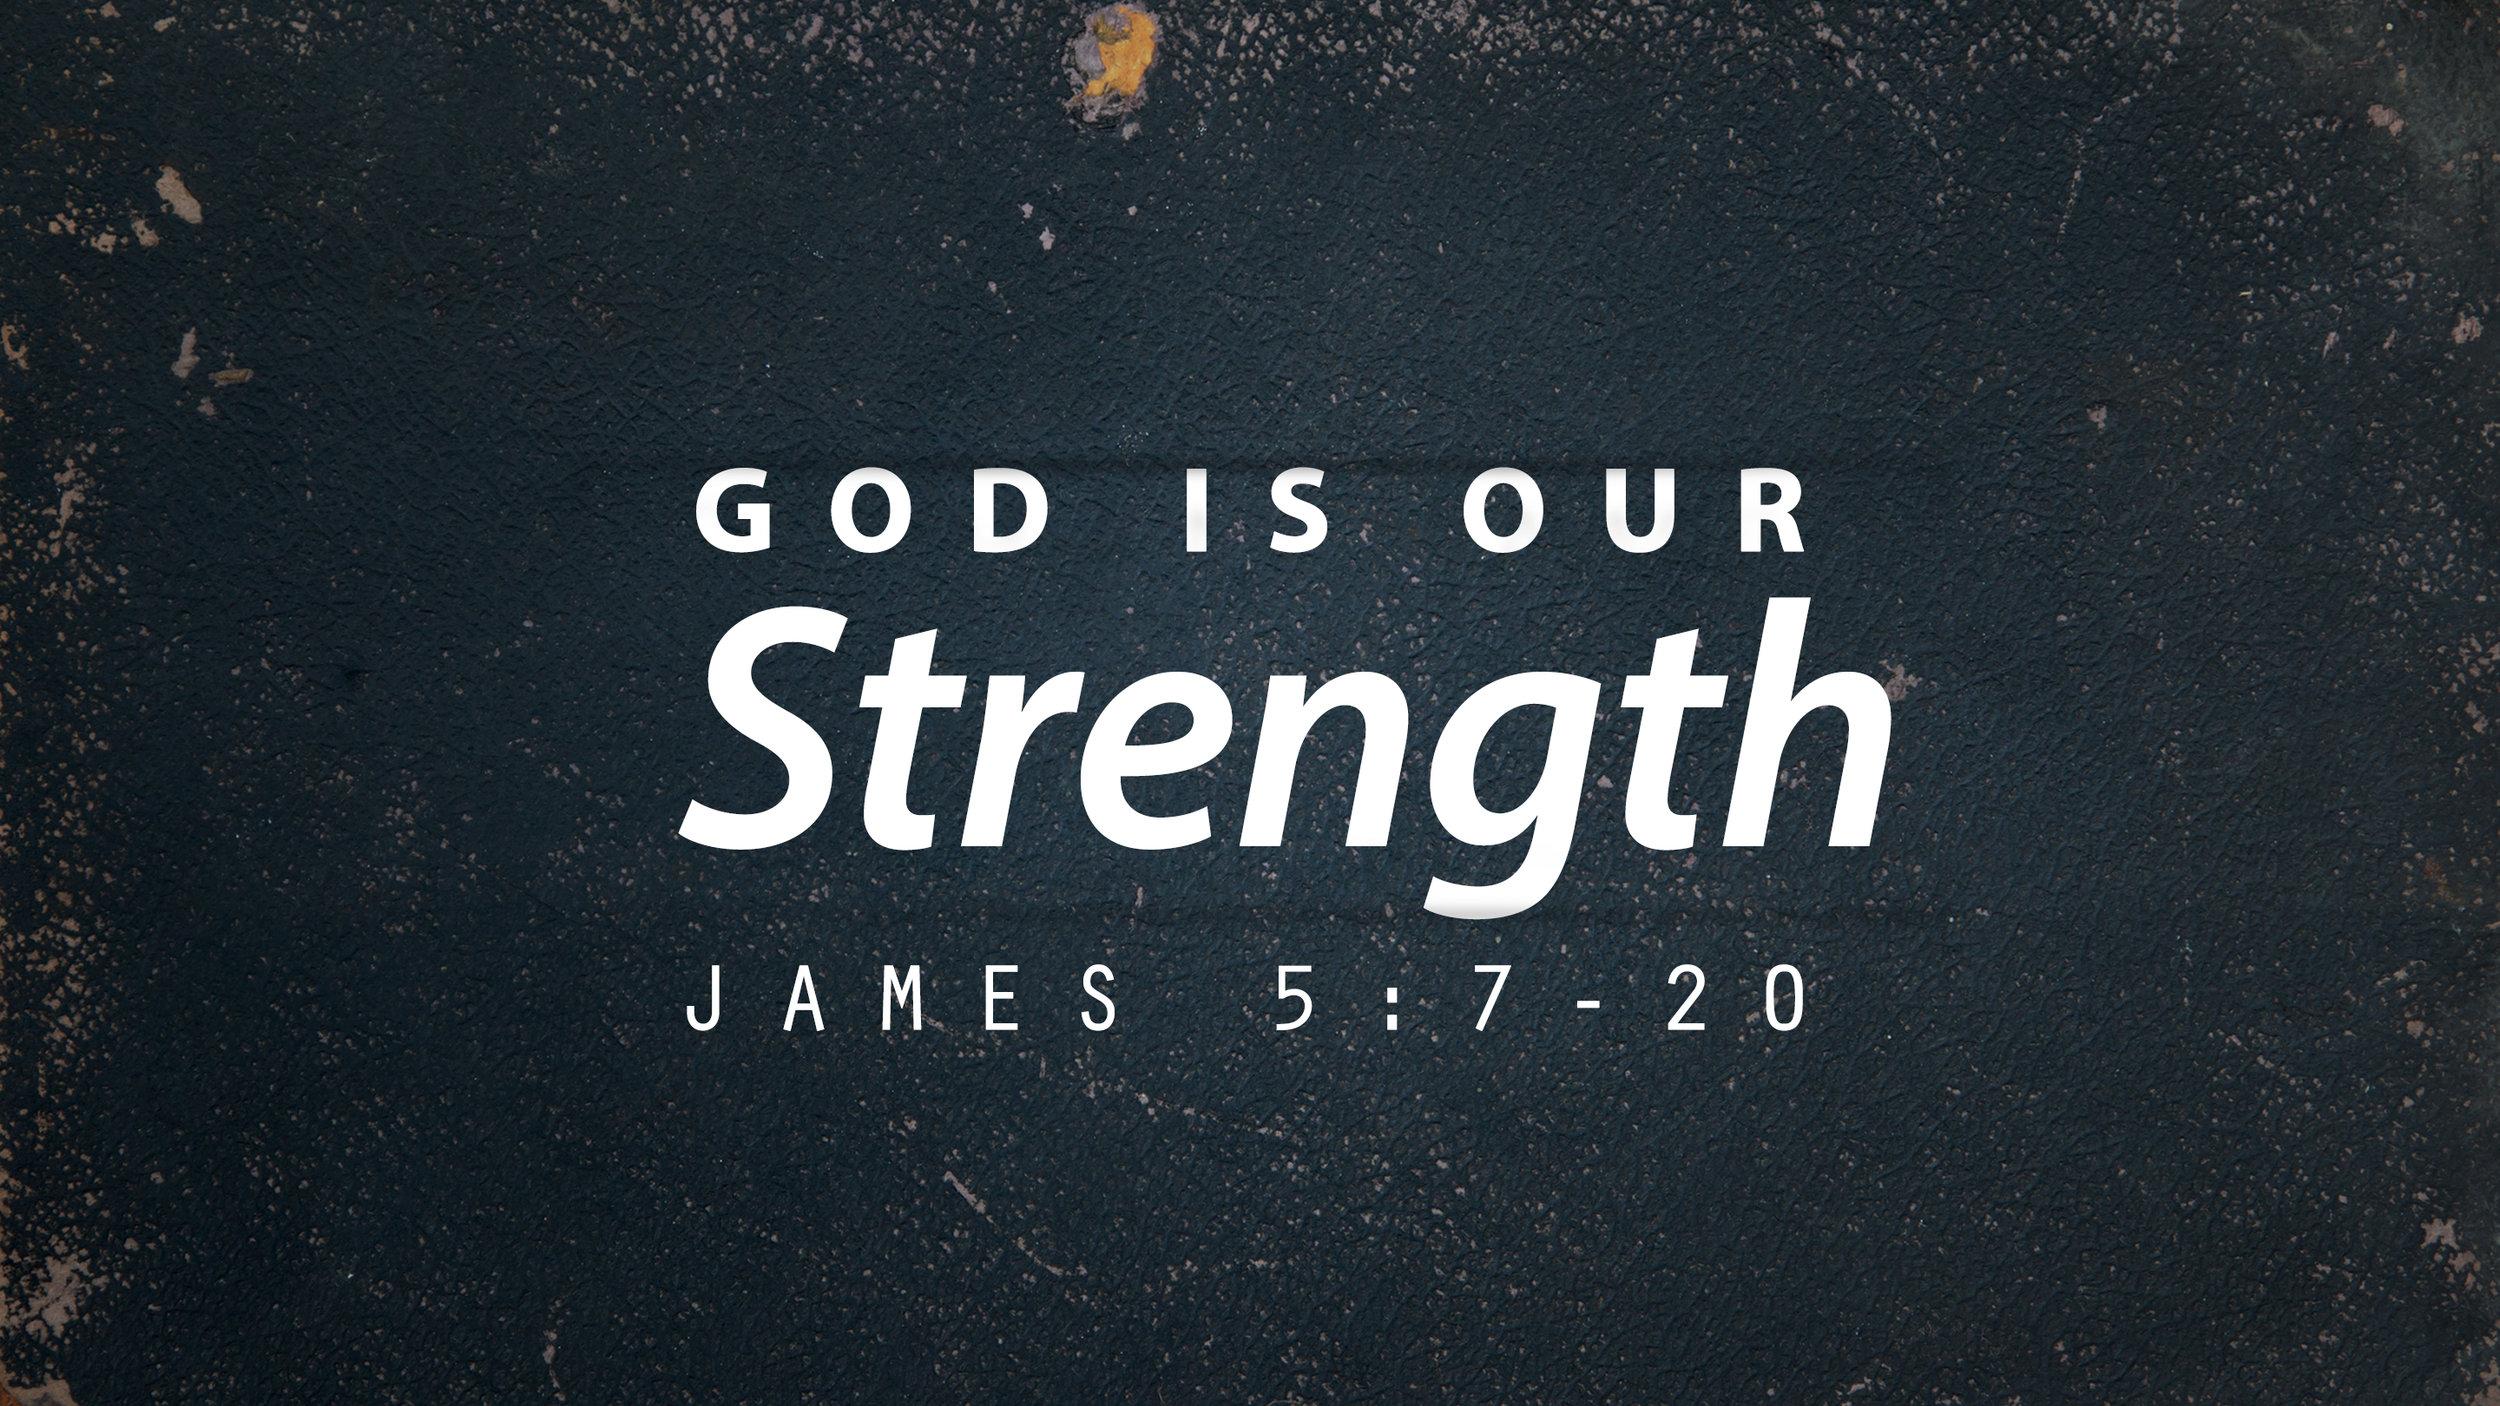 James 5: 7 - 20 - Dr. Kevin Maples